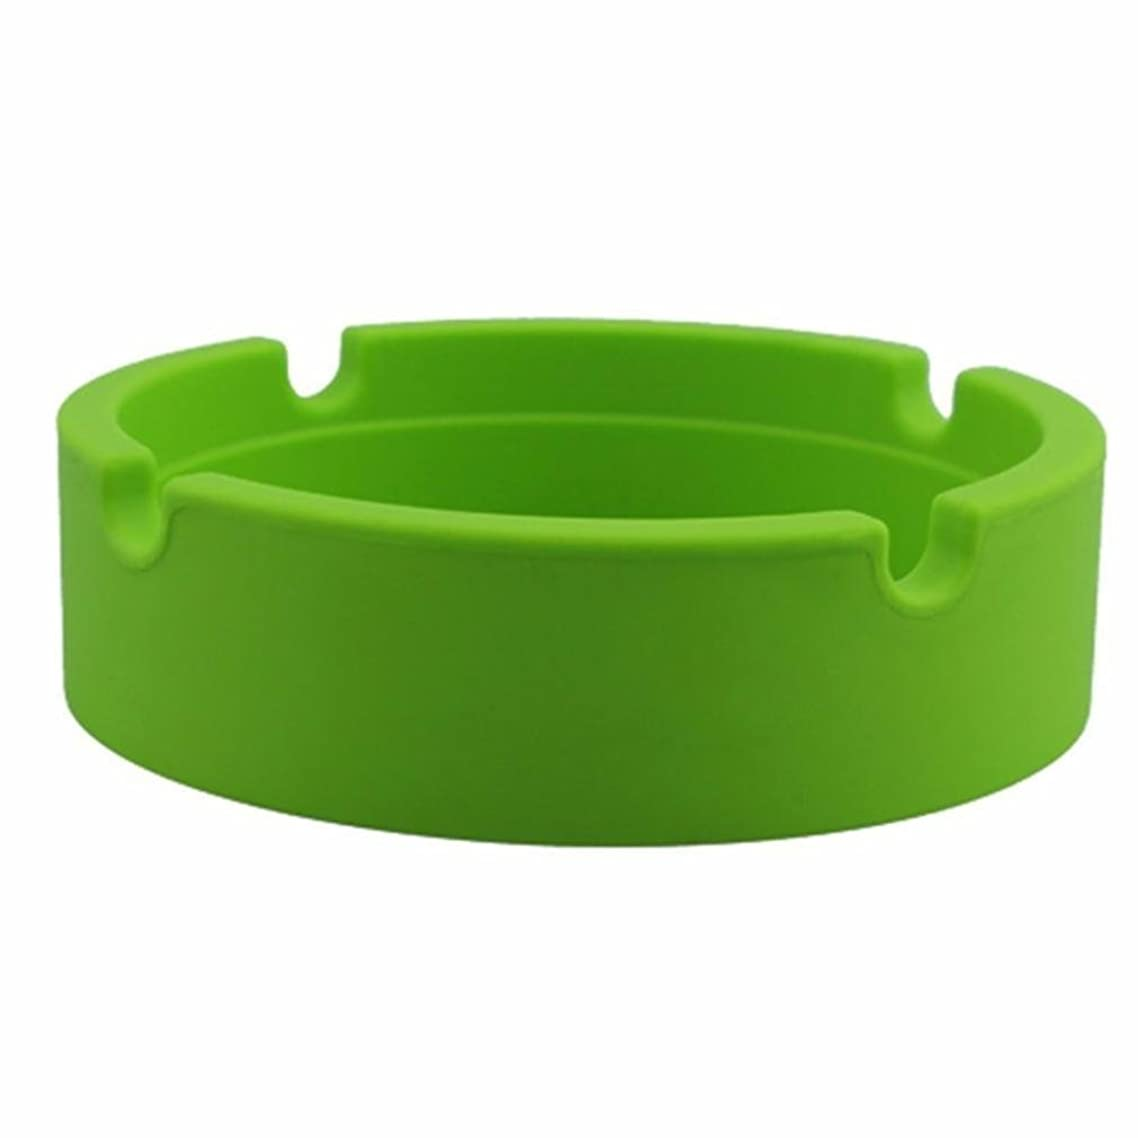 Silicone Ashtray, Iuhan Round Eco-Friendly Colorfull Premium Silicone Rubber Tobacco Tray (Green)